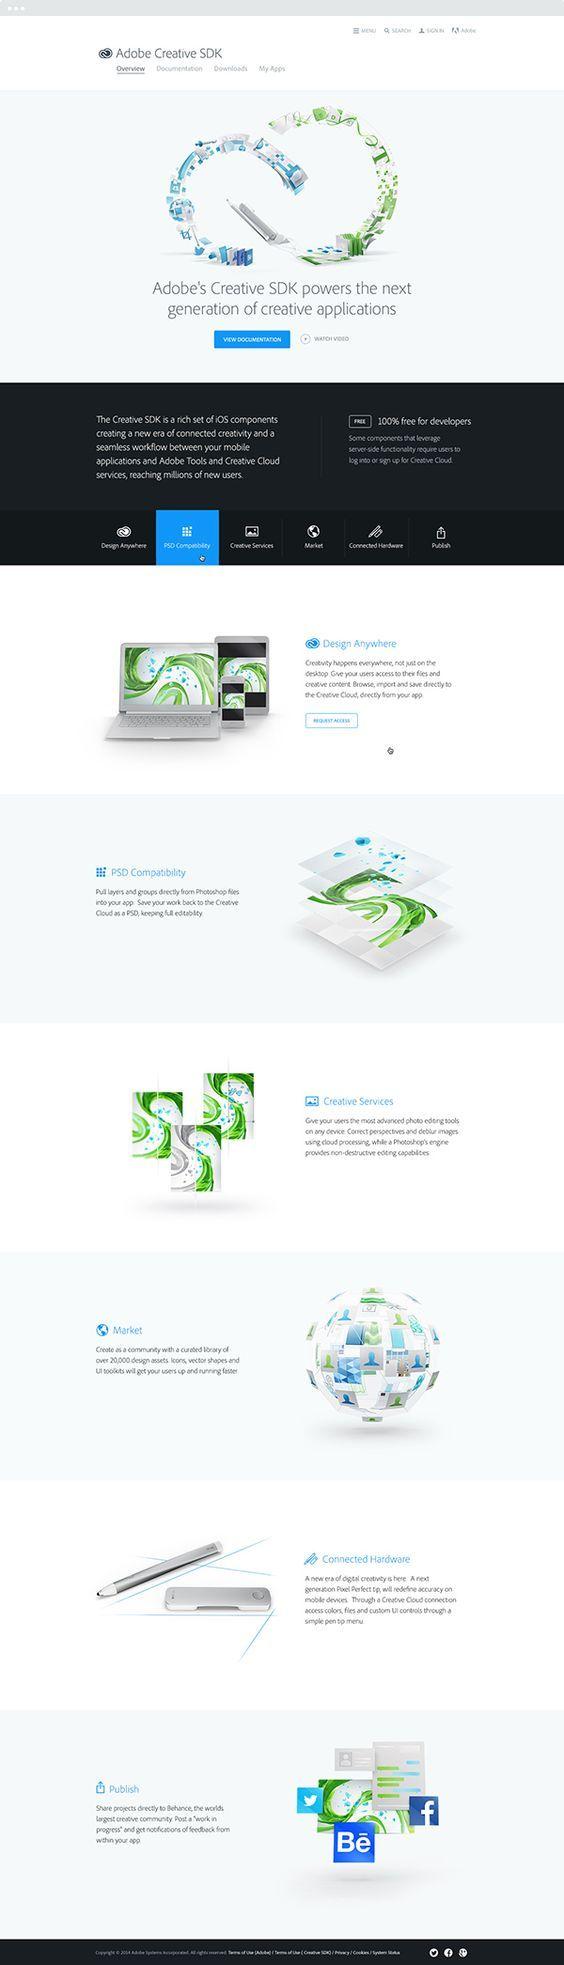 Pin By El Nino On Landing Page Modern Web Design Web Template Design Mobile Web Design